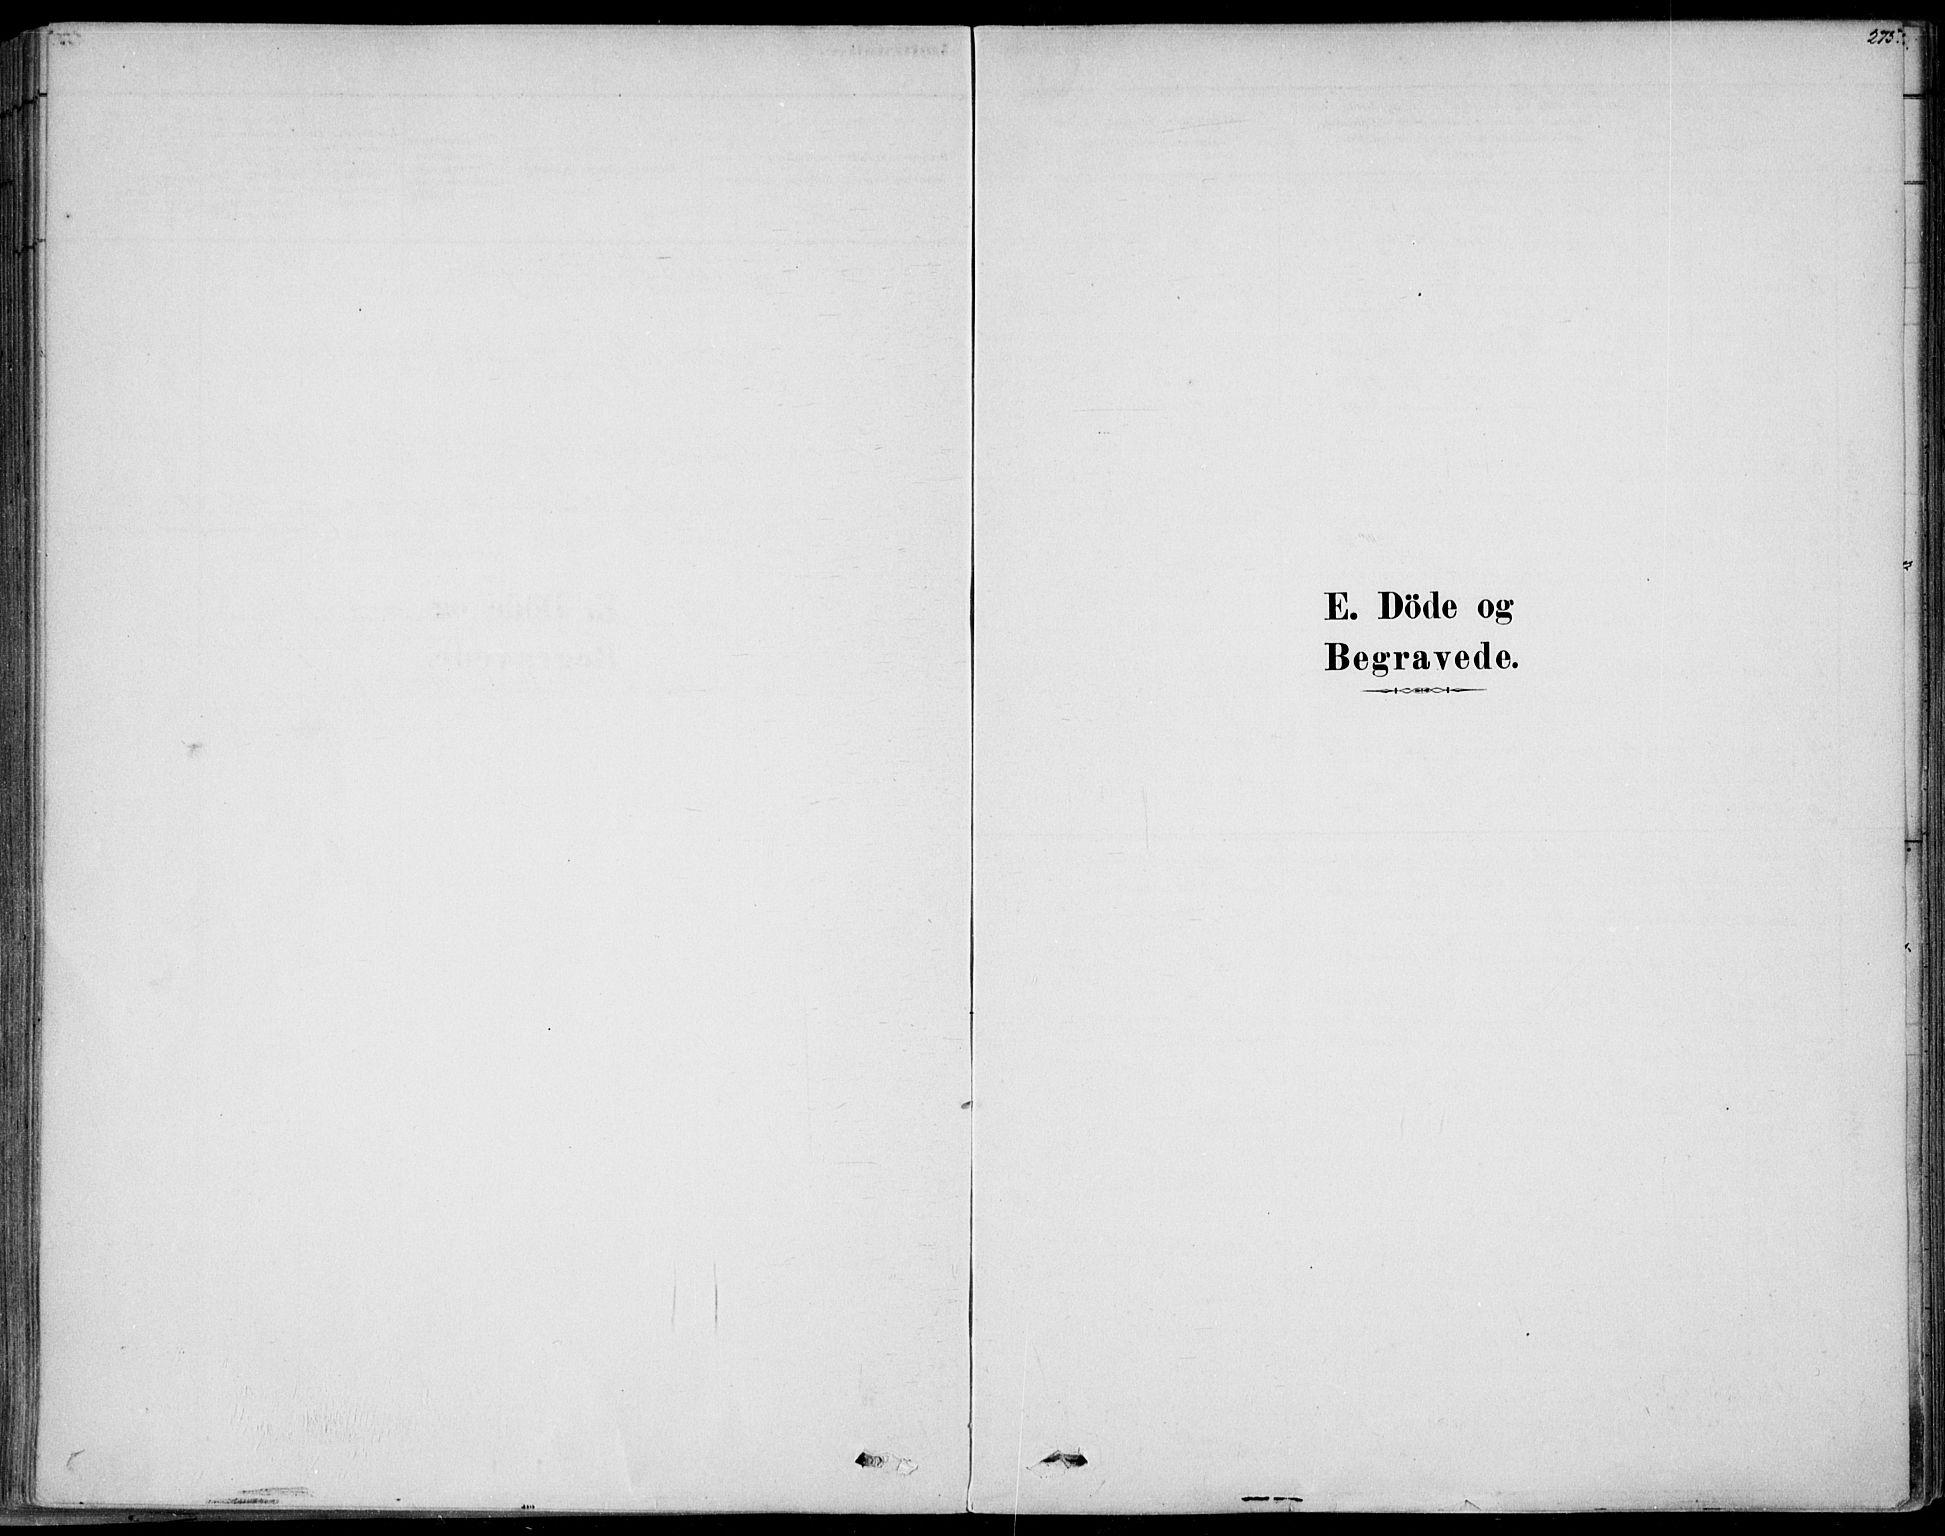 SAKO, Sem kirkebøker, F/Fb/L0004: Ministerialbok nr. II 4, 1878-1891, s. 275